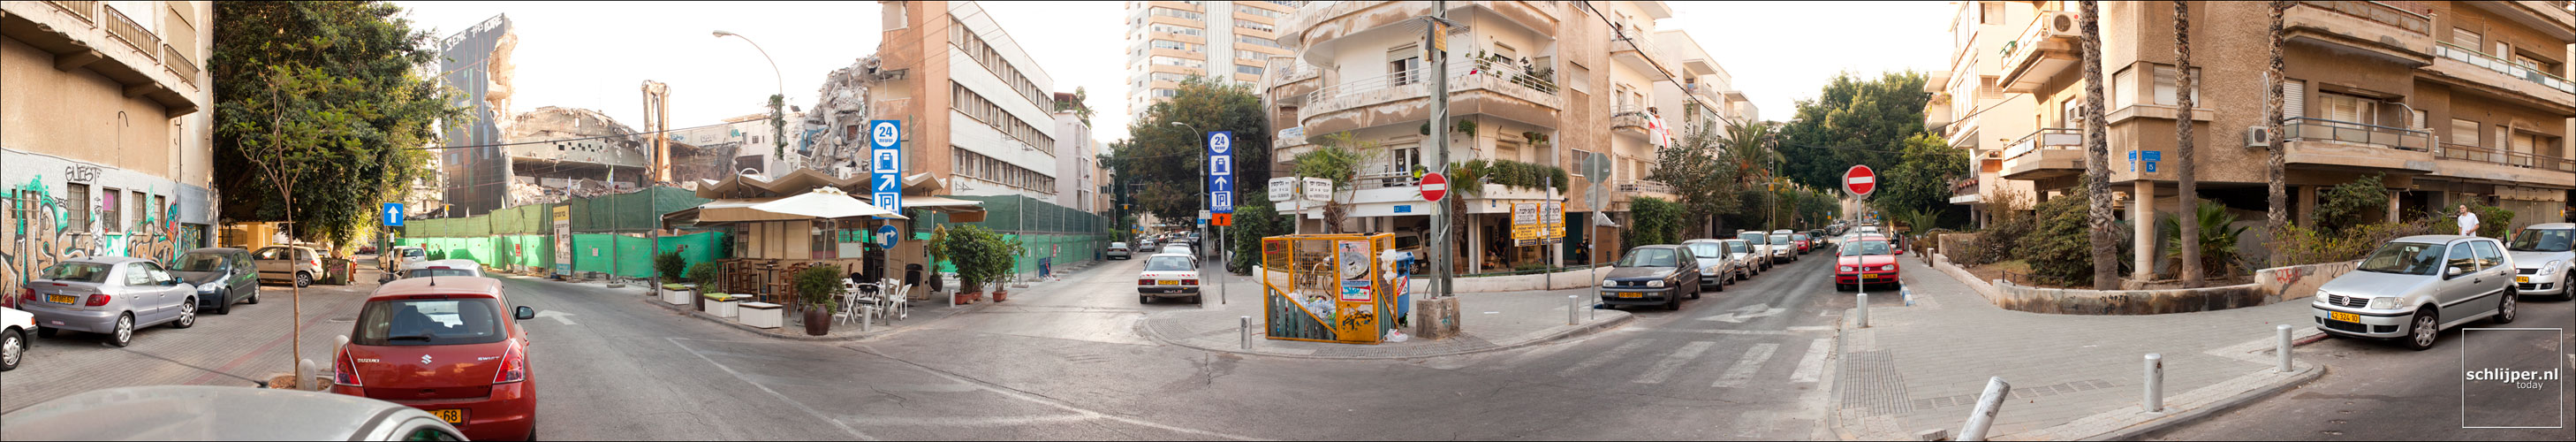 Israel, Tel Aviv, 10 november 2010